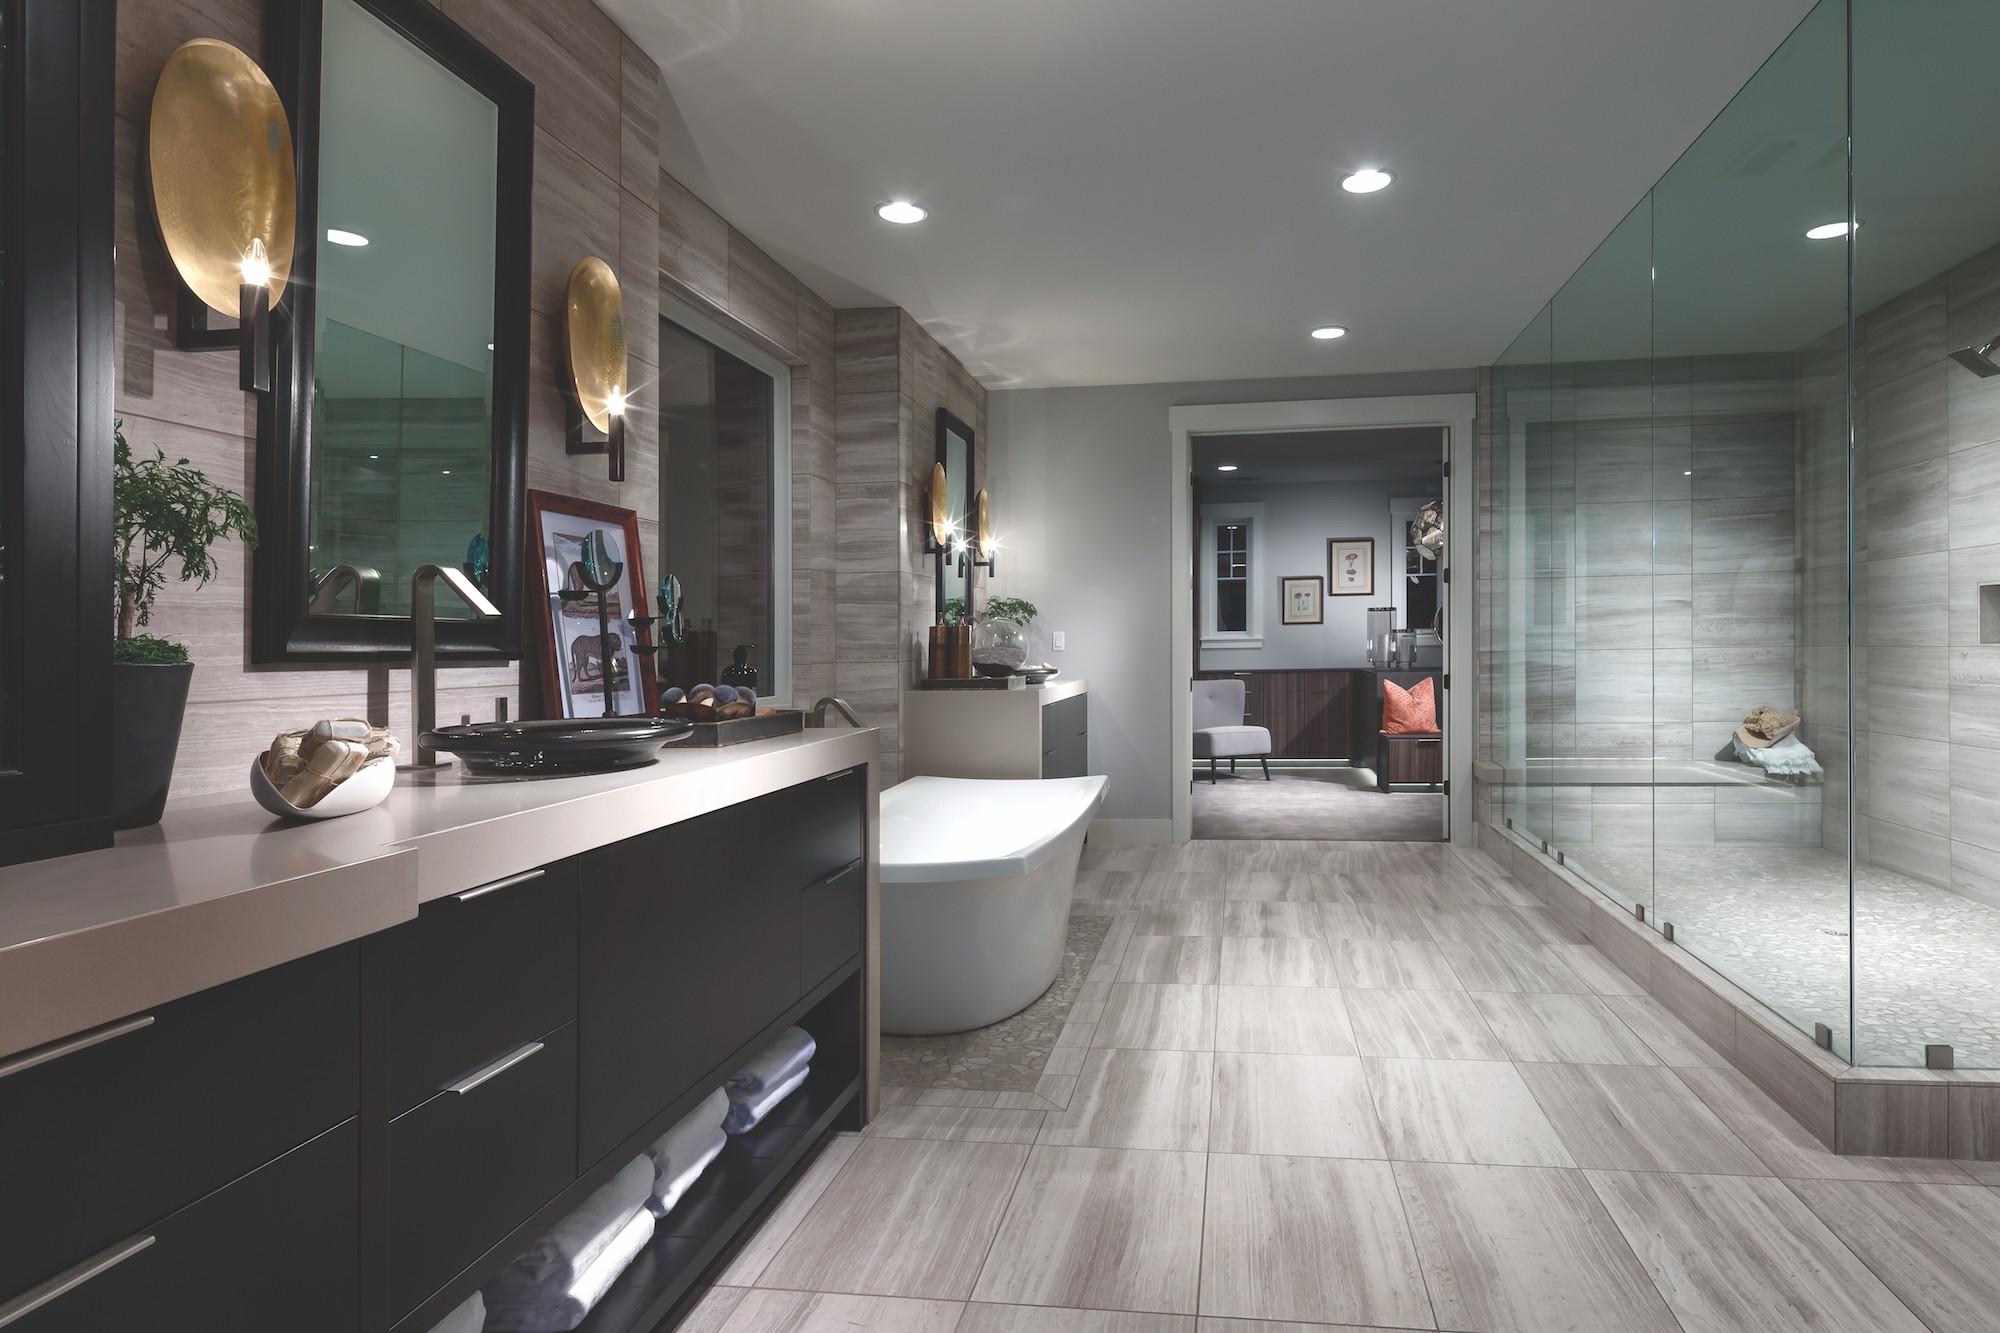 Master Bathroom Size  25 Luxury Bathroom Ideas & Designs